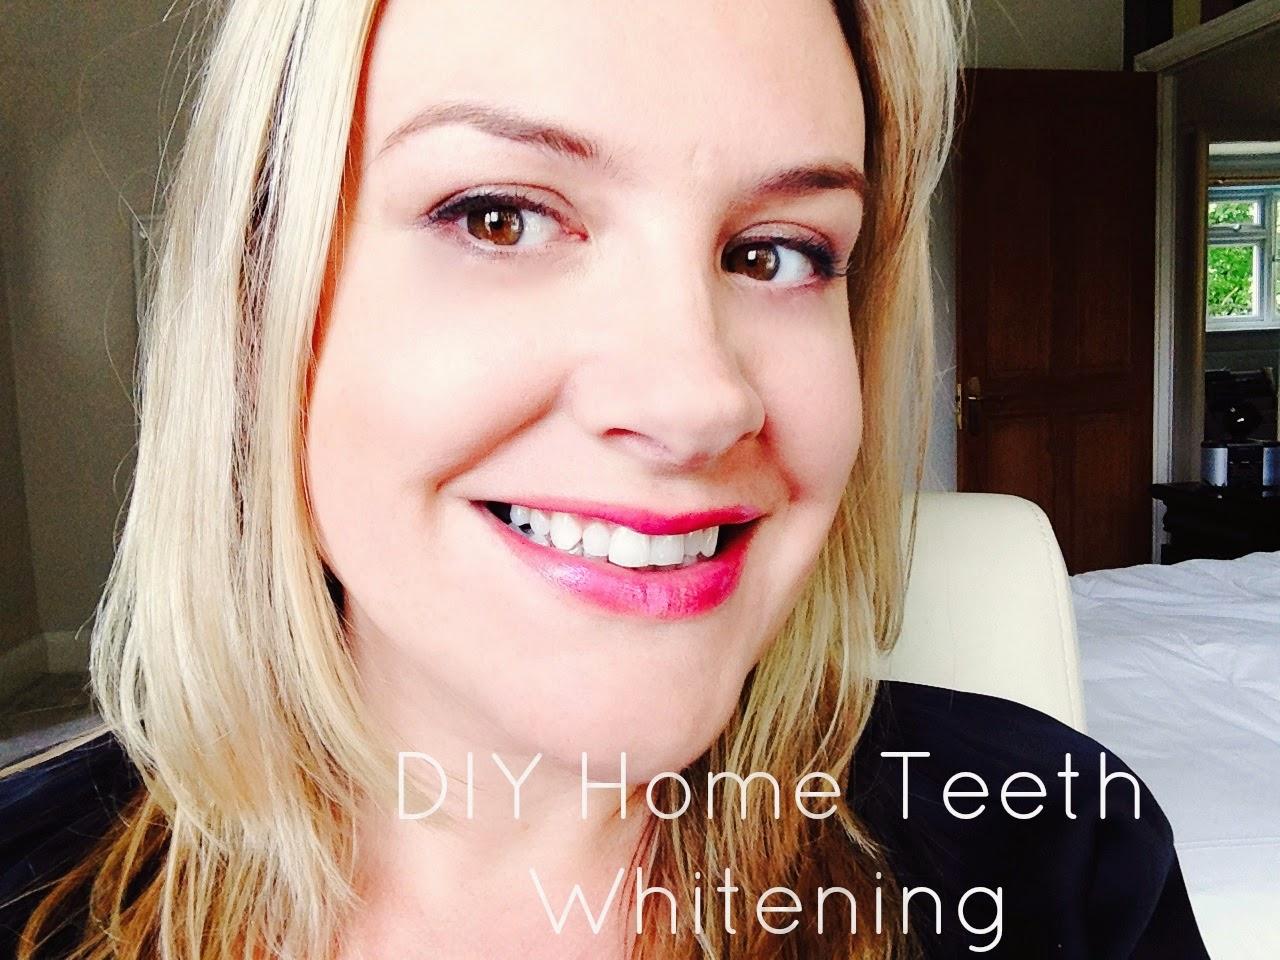 DIY-Home-whiteneing-Teeth-UK-How-To